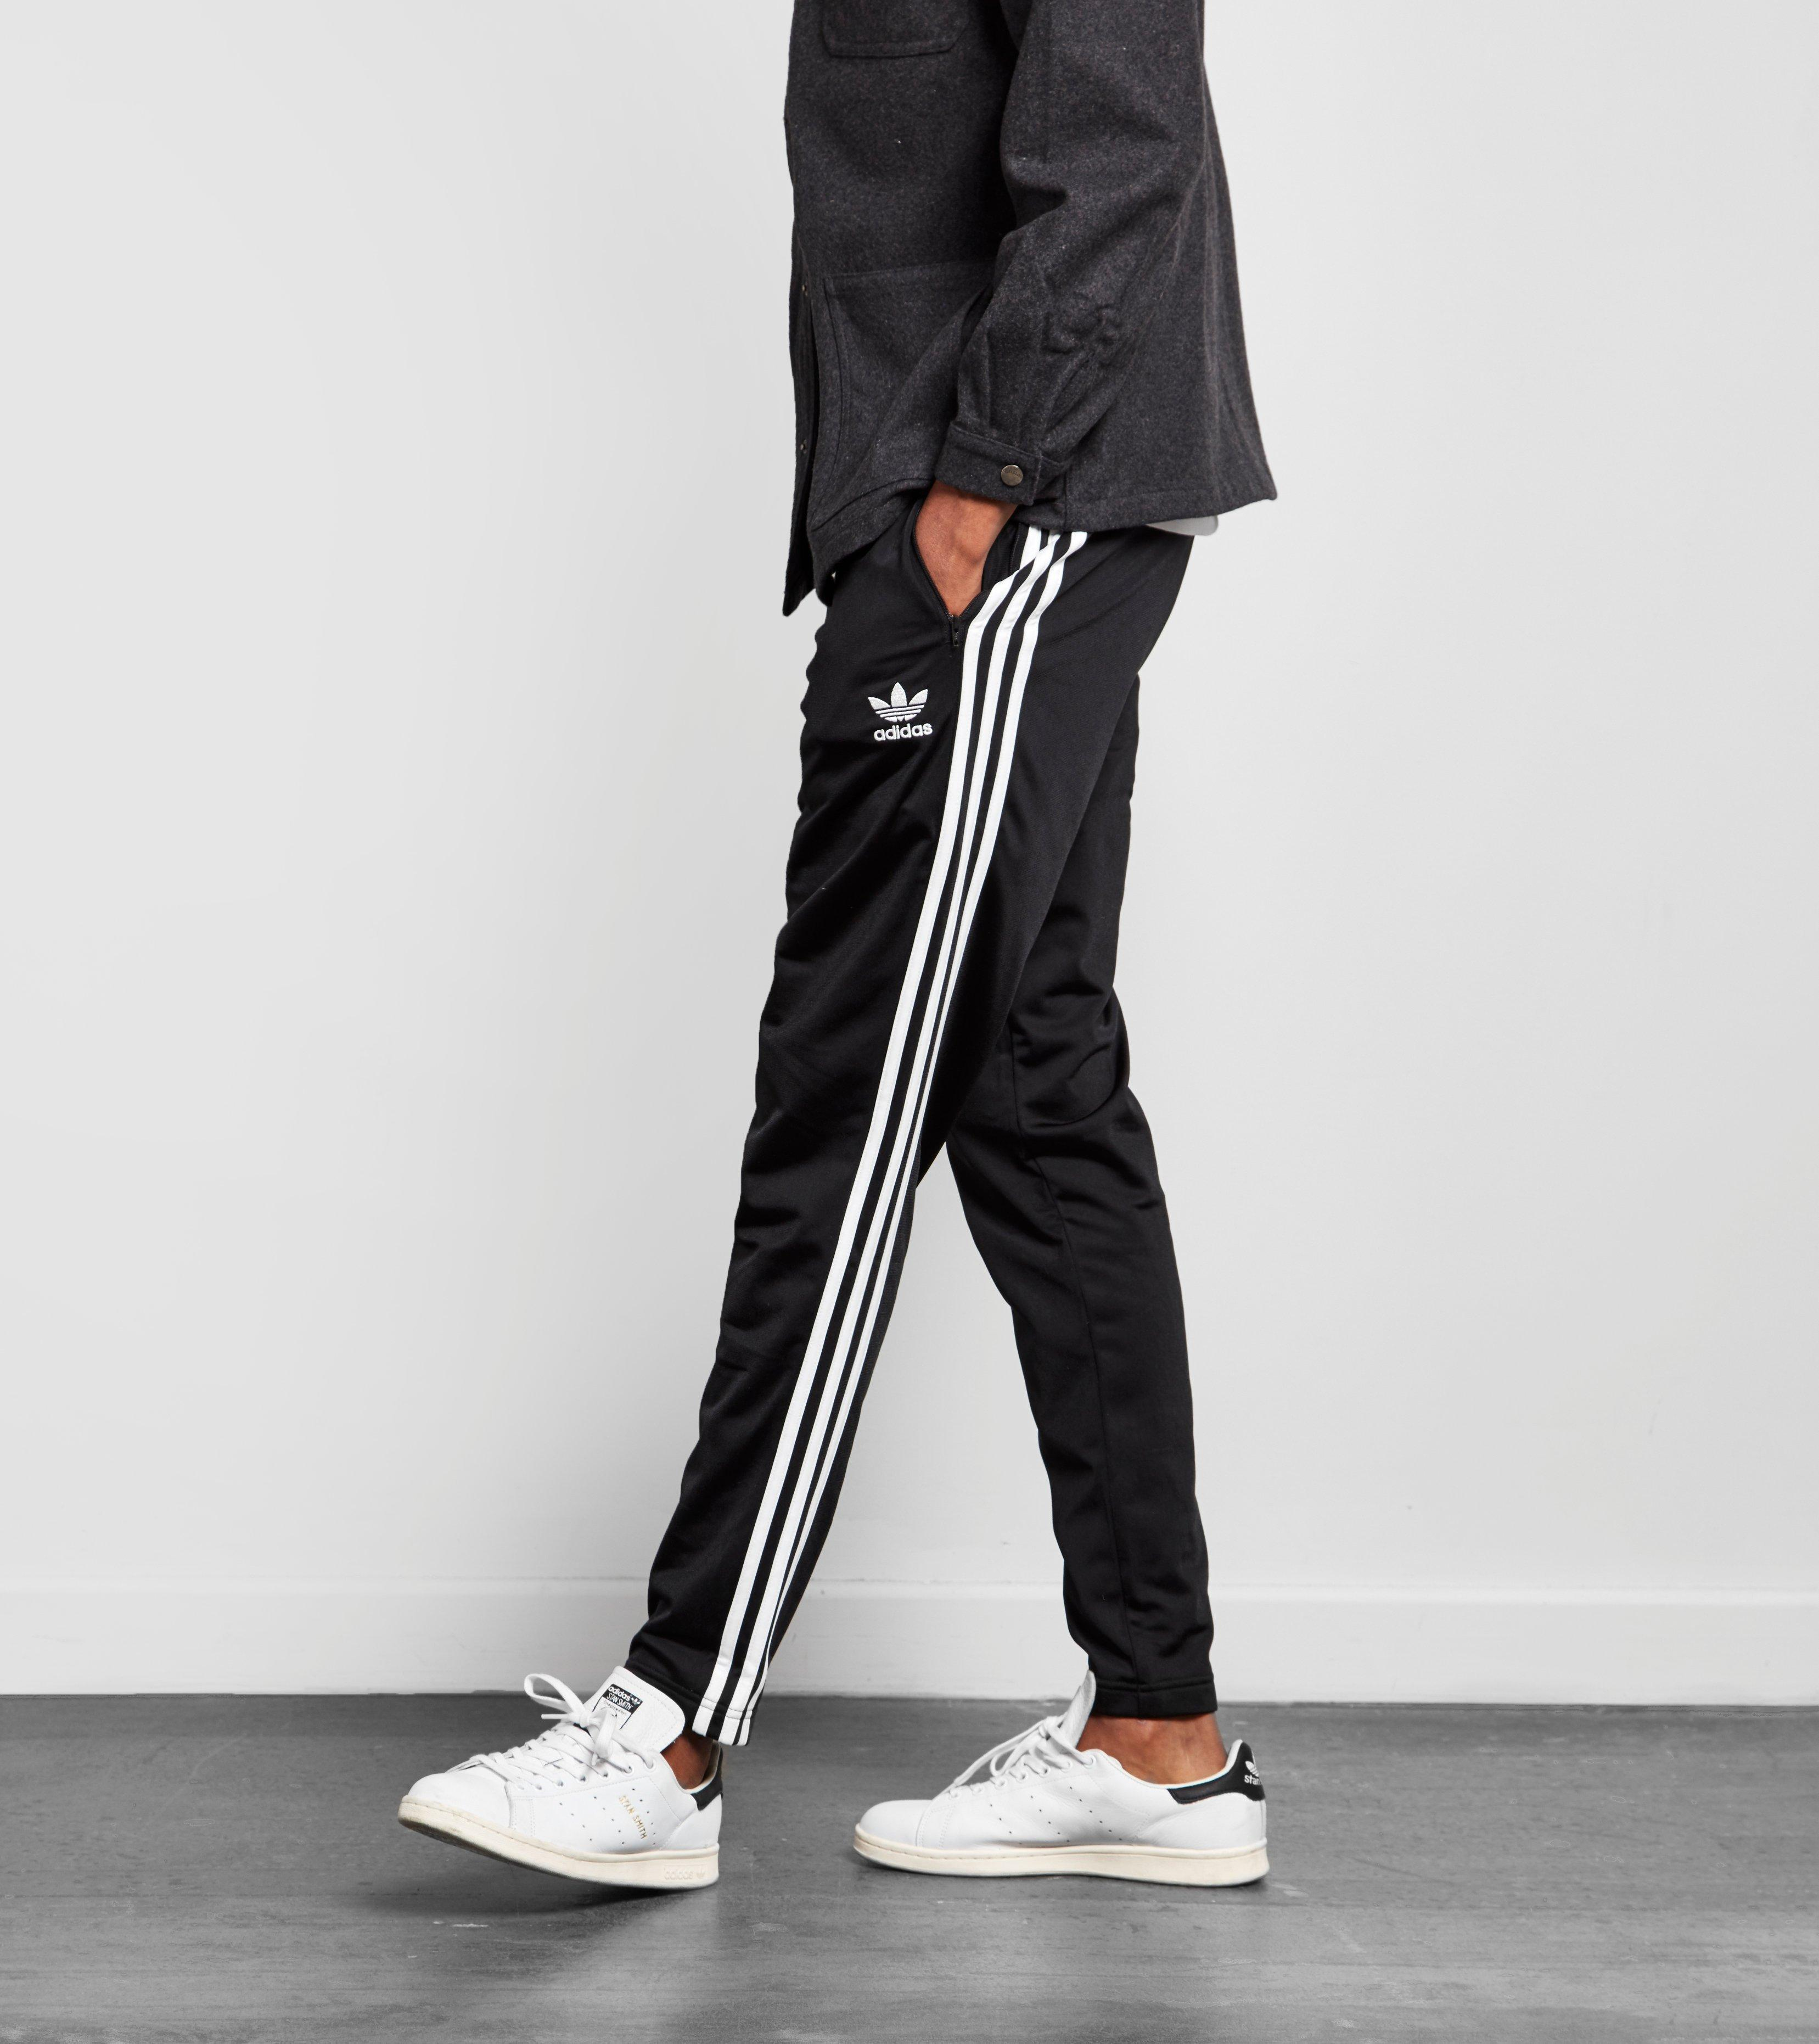 Adidas Originals Black Superstar Taper Track Pants for men